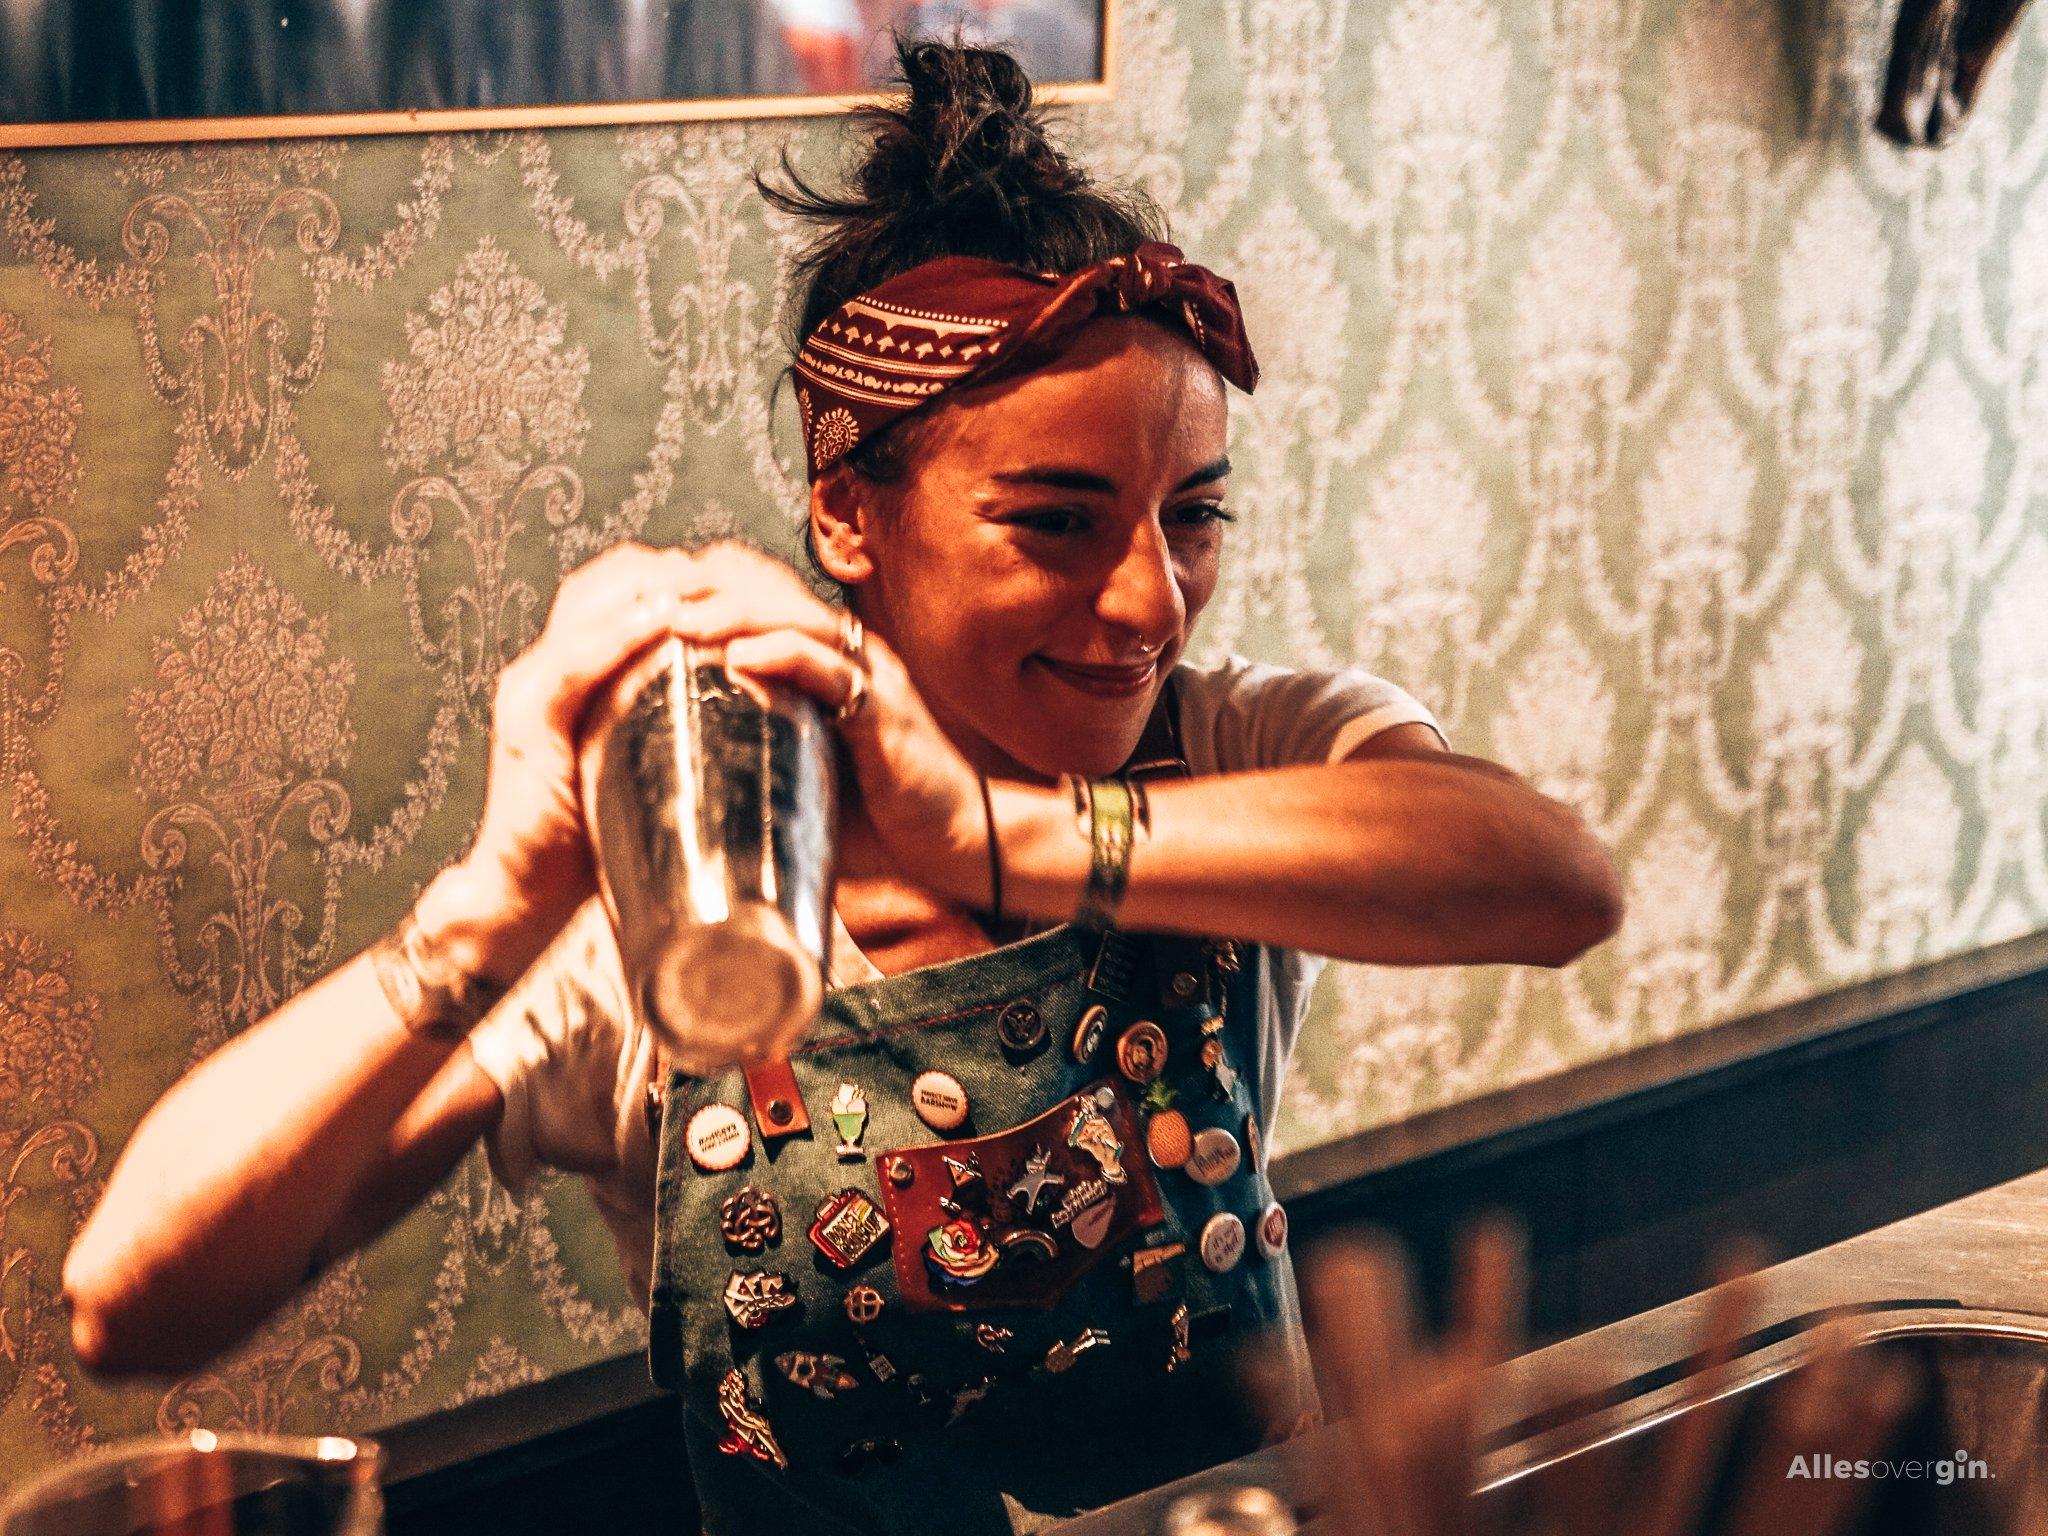 A bartender's story, bartender Alice Razzi, Alles over gin.